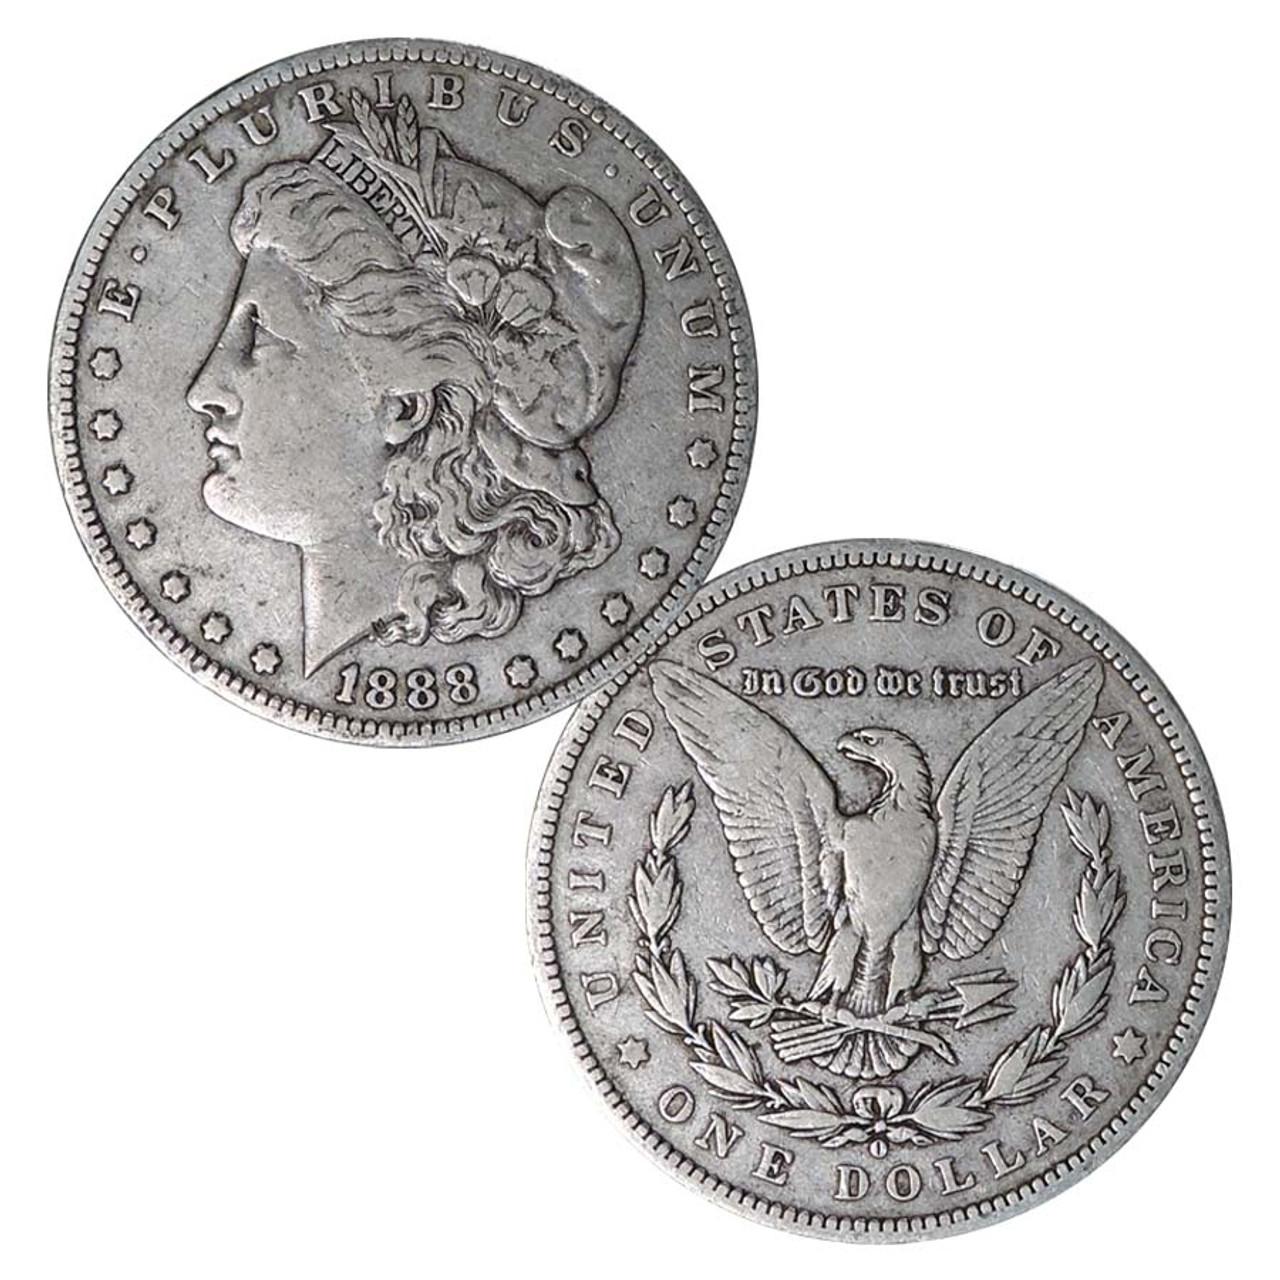 1888-O Morgan Silver Dollar Very Fine Image 1